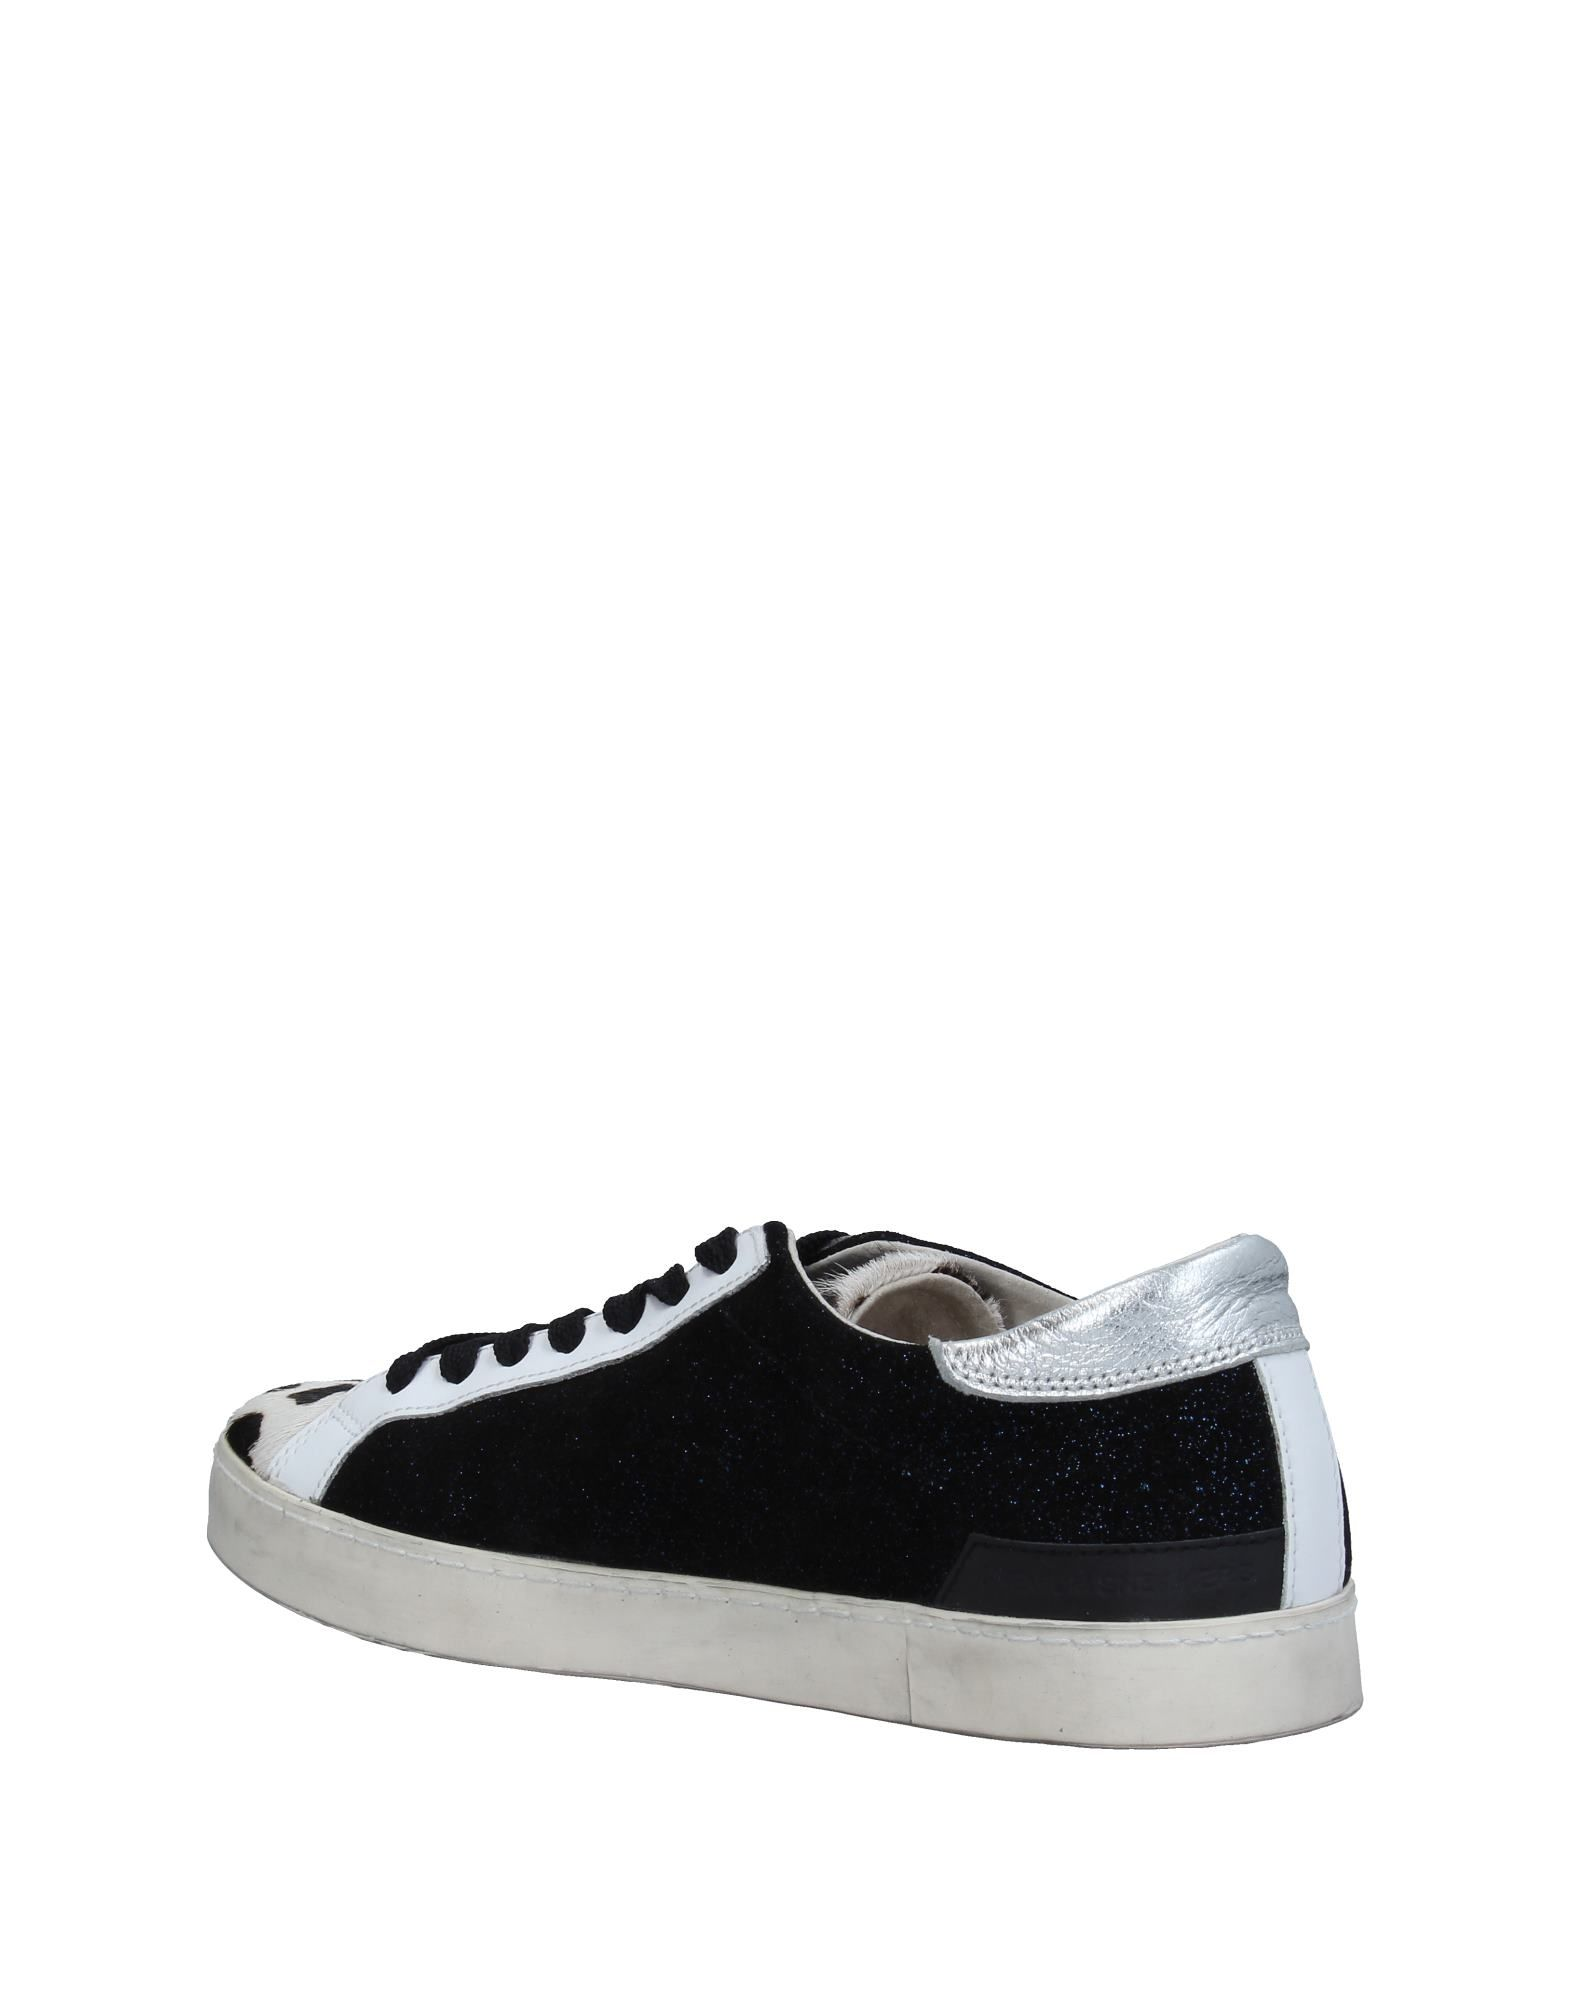 D.A.T.E. Sneakers - Women D.A.T.E. Sneakers online - on  United Kingdom - online 11339616GT 544c06